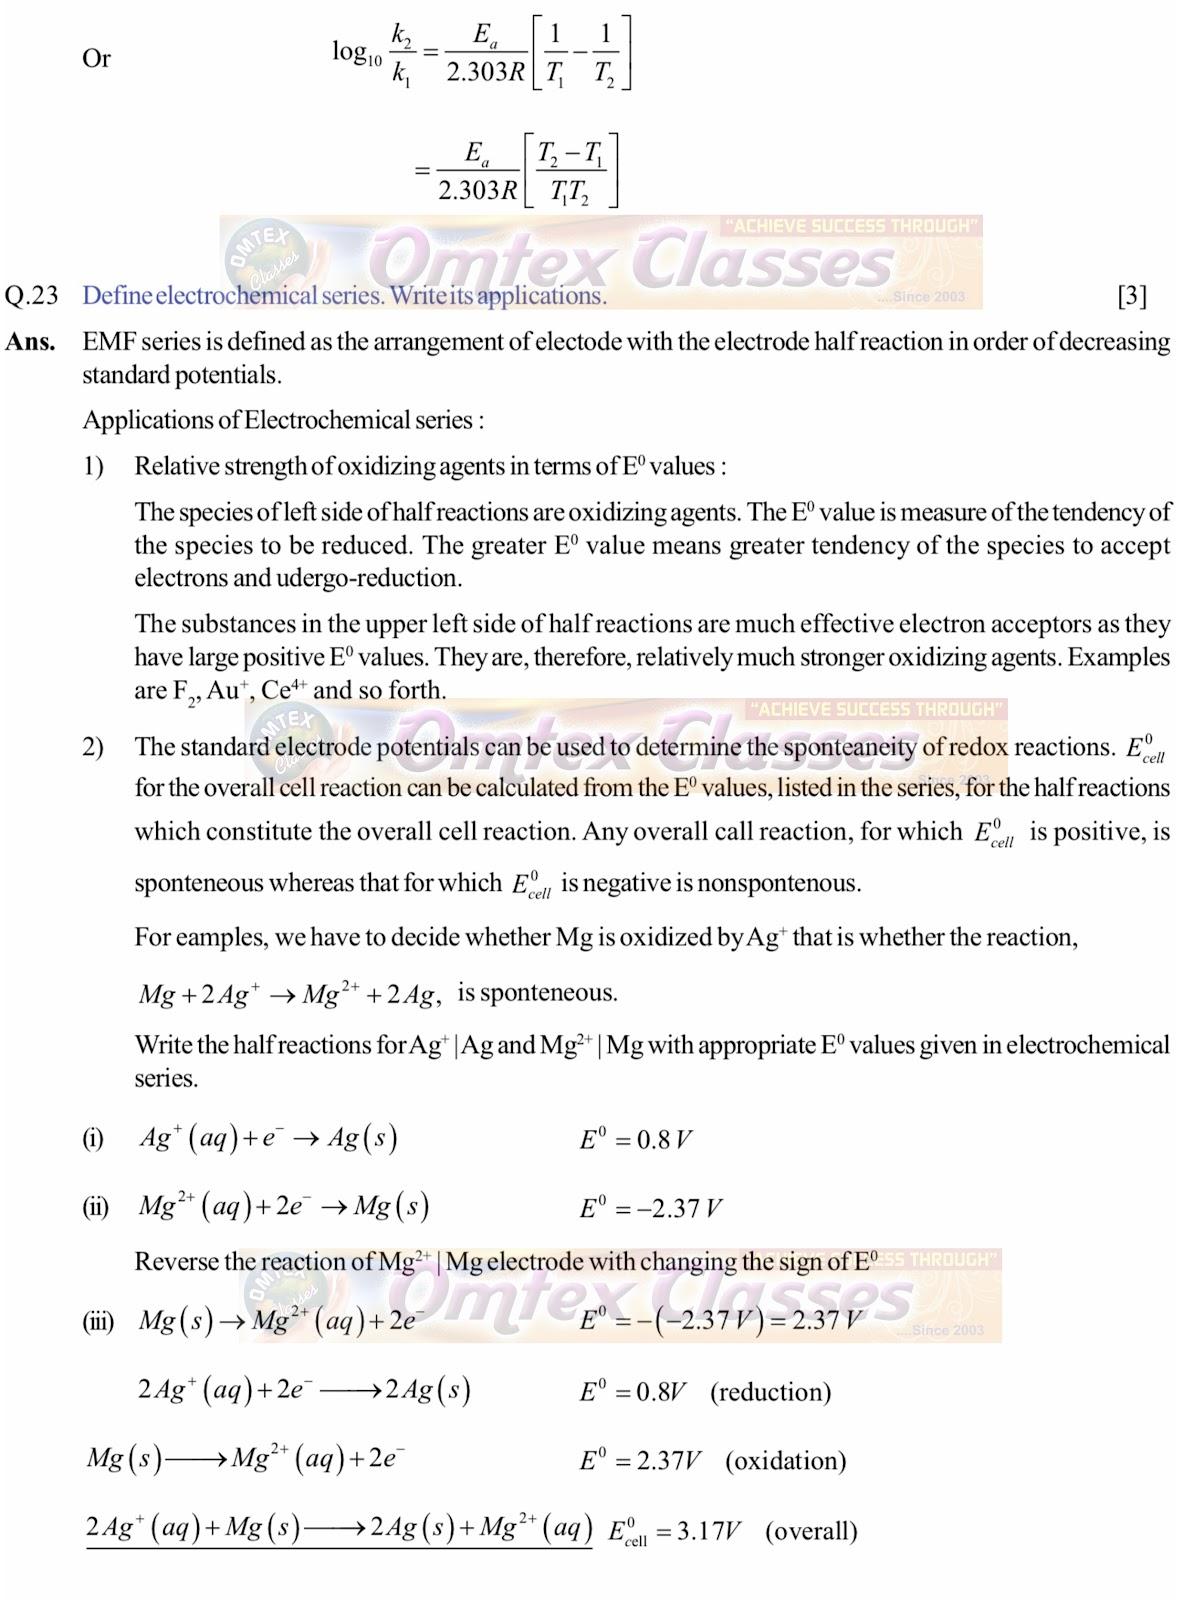 OMTEX CLASSES MAHARASHTRA : Chemistry exam Paper Solution February 2019